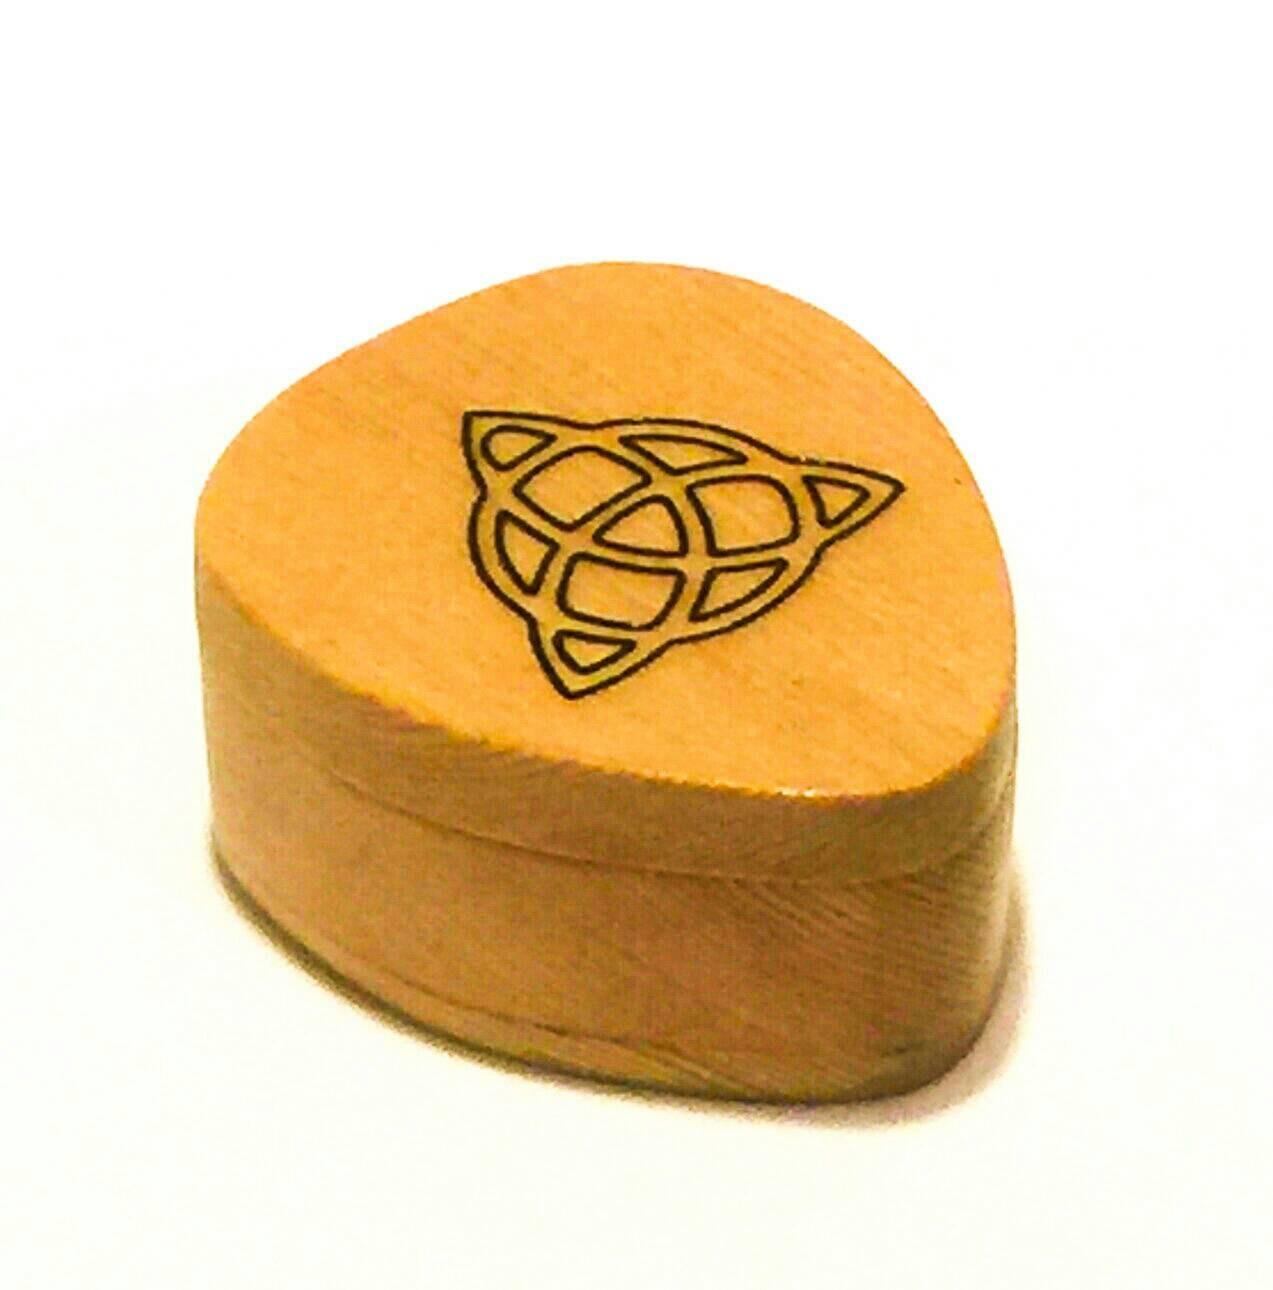 guitar pick box wooden guitar pick box pick holder pick etsy. Black Bedroom Furniture Sets. Home Design Ideas